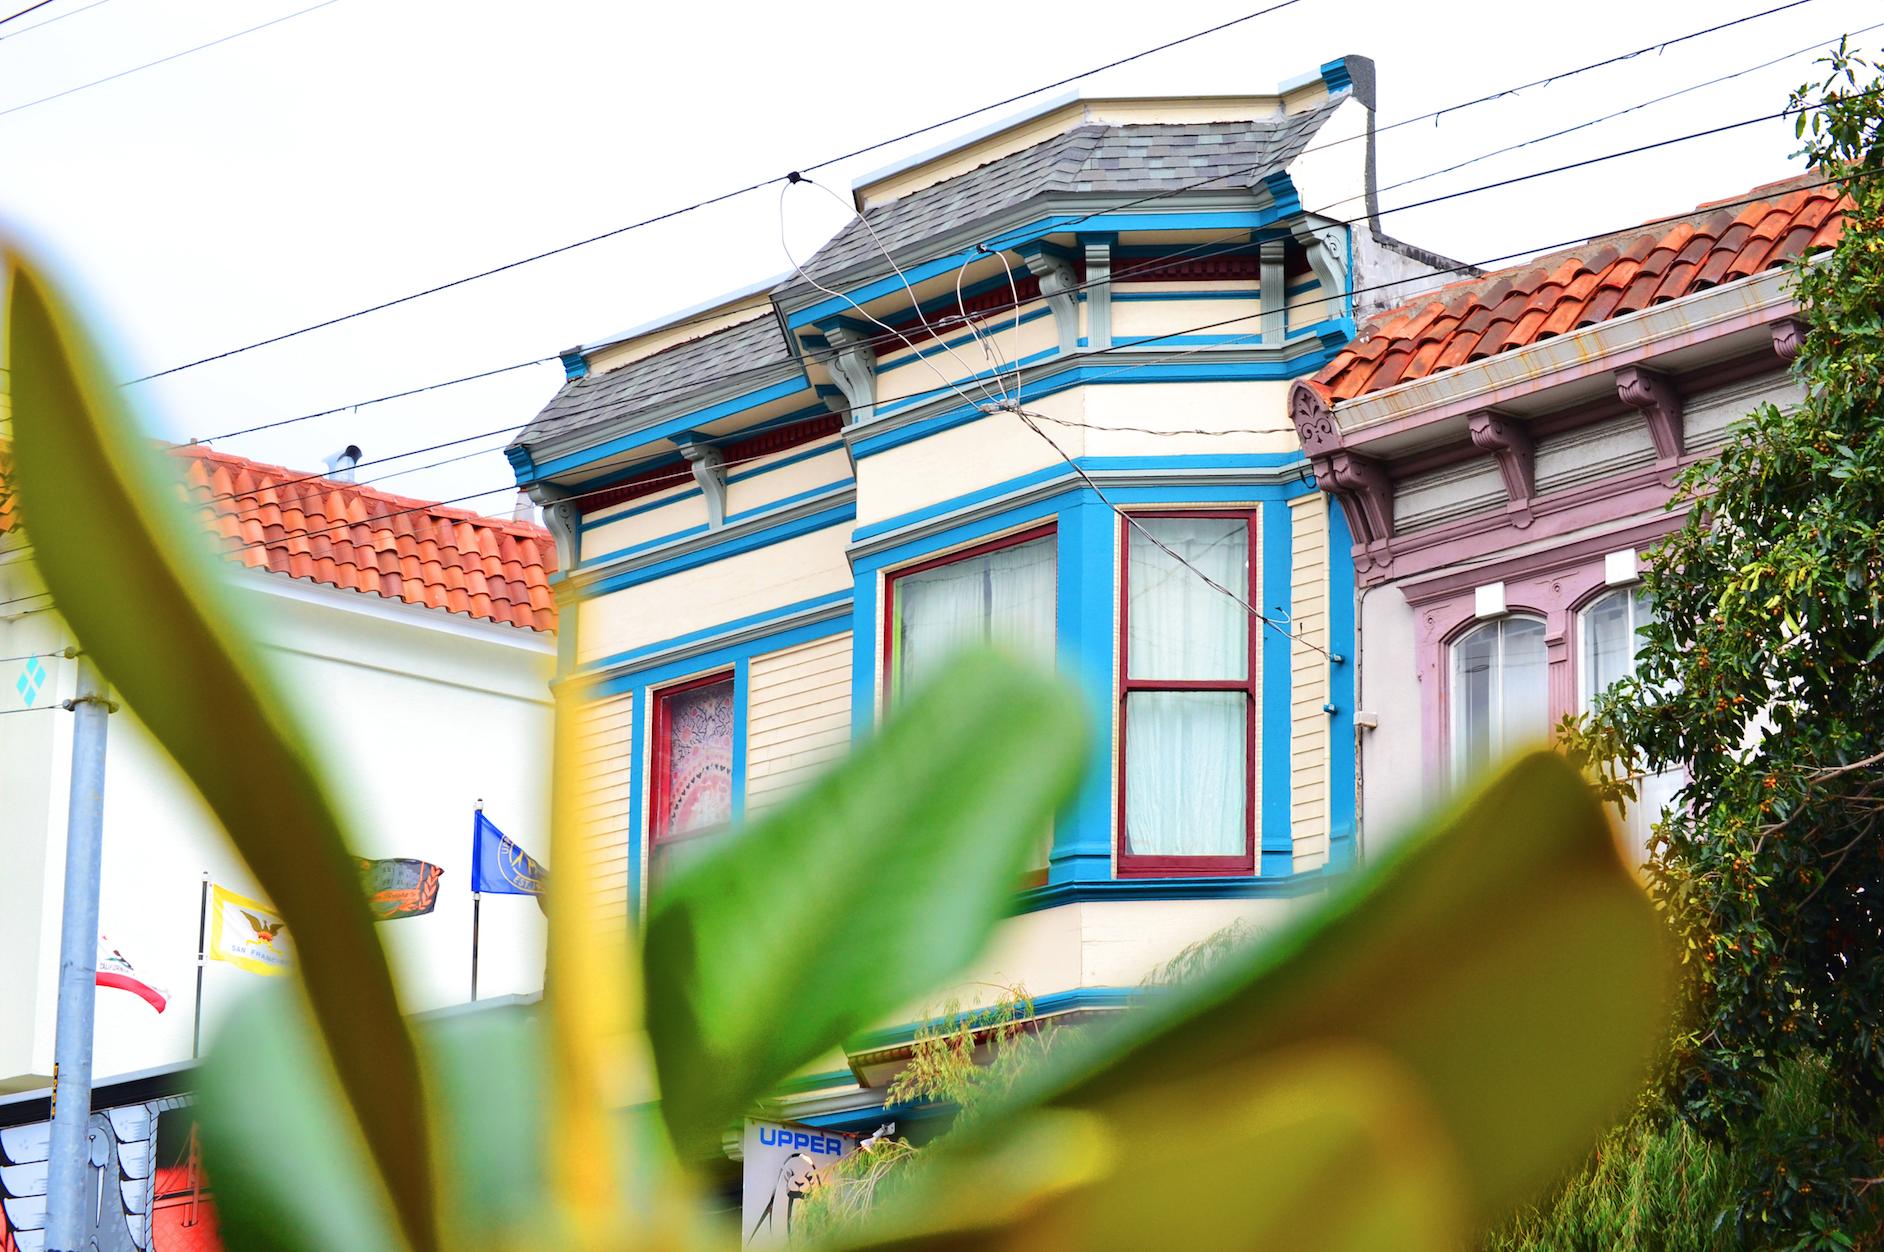 Aliana+Grace+Bailey+San+Francisco+California+Houses+3.png